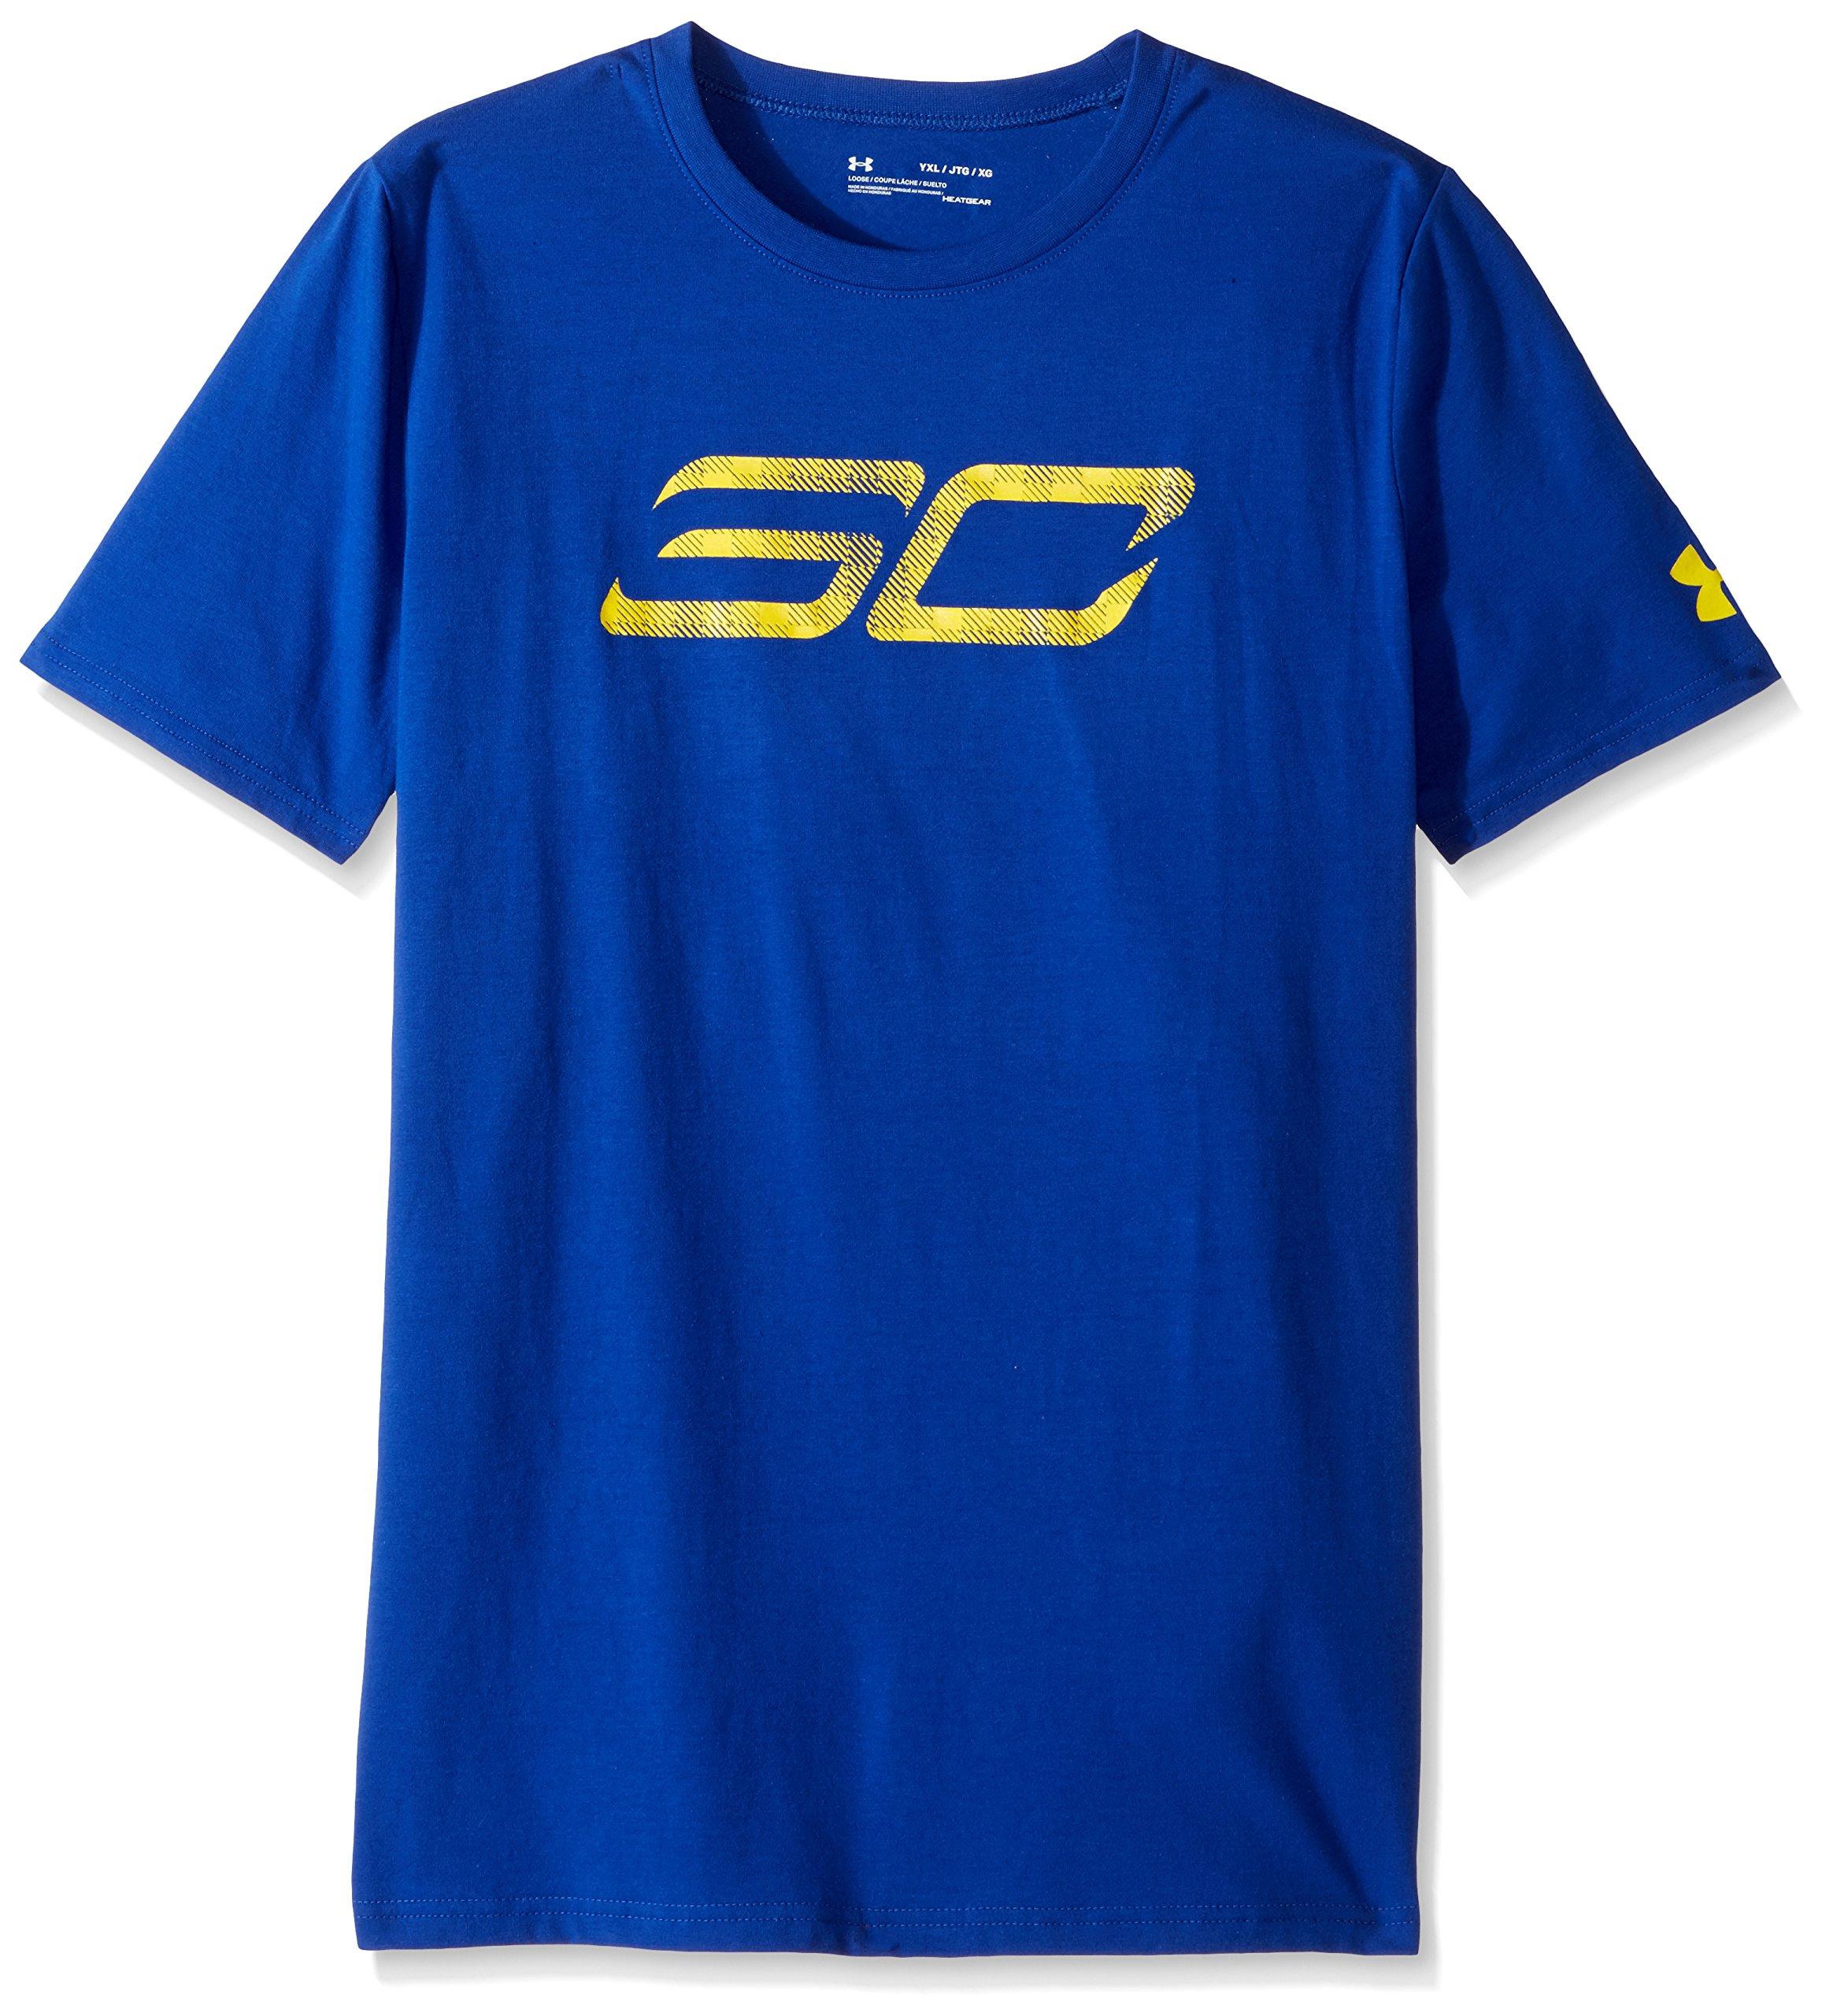 Under Armour Boys' SC30 Logo T-Shirt,Royal (400)/Taxi, Youth X-Small